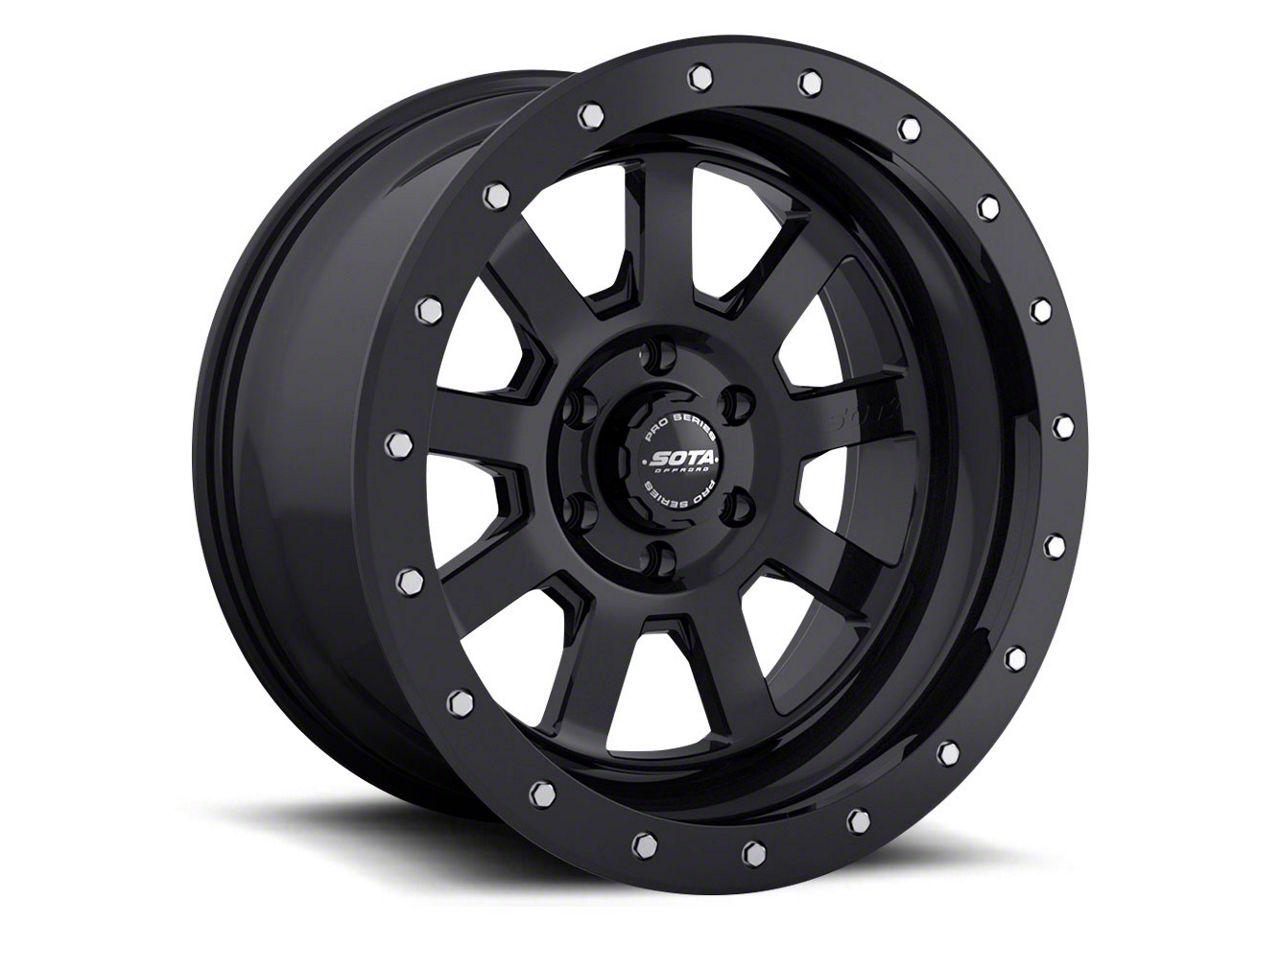 SOTA Off Road S.S.D. Stealth Black Wheel - 20x10 (07-18 Jeep Wrangler JK; 2018 Jeep Wrangler JL)